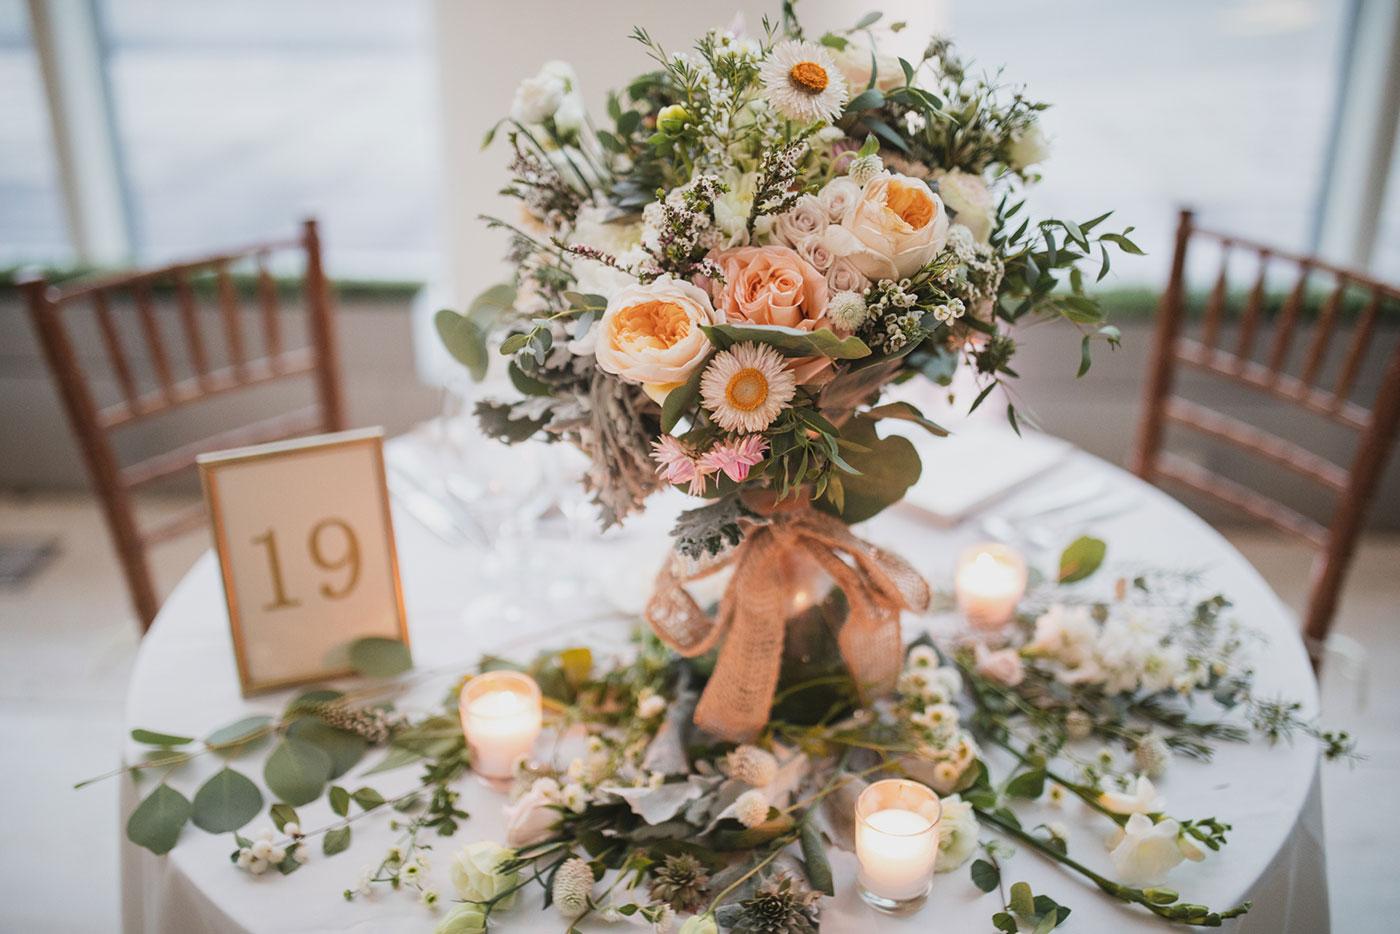 reception table setting at a wedding at Saint Thomas of Villanova by Weddings by Hanel